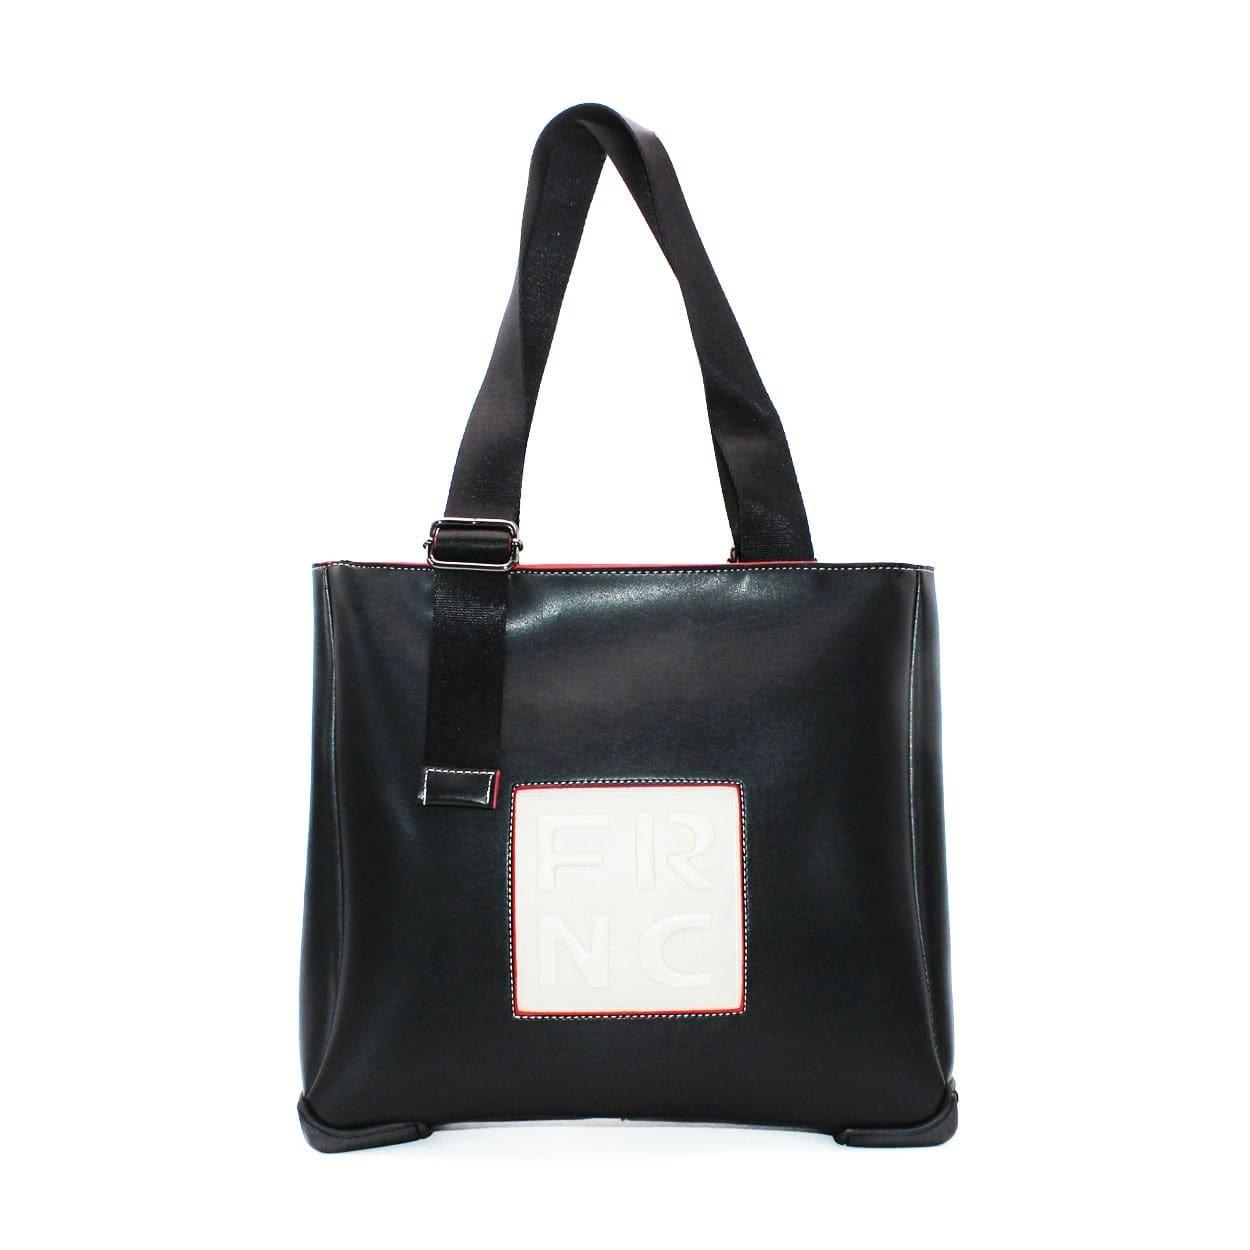 a2a11e6bed FRNC FRANCESCO Τσάντα Γυναικεία Ώμου 2020 Μαύρο Δέρμα – IShoeStore